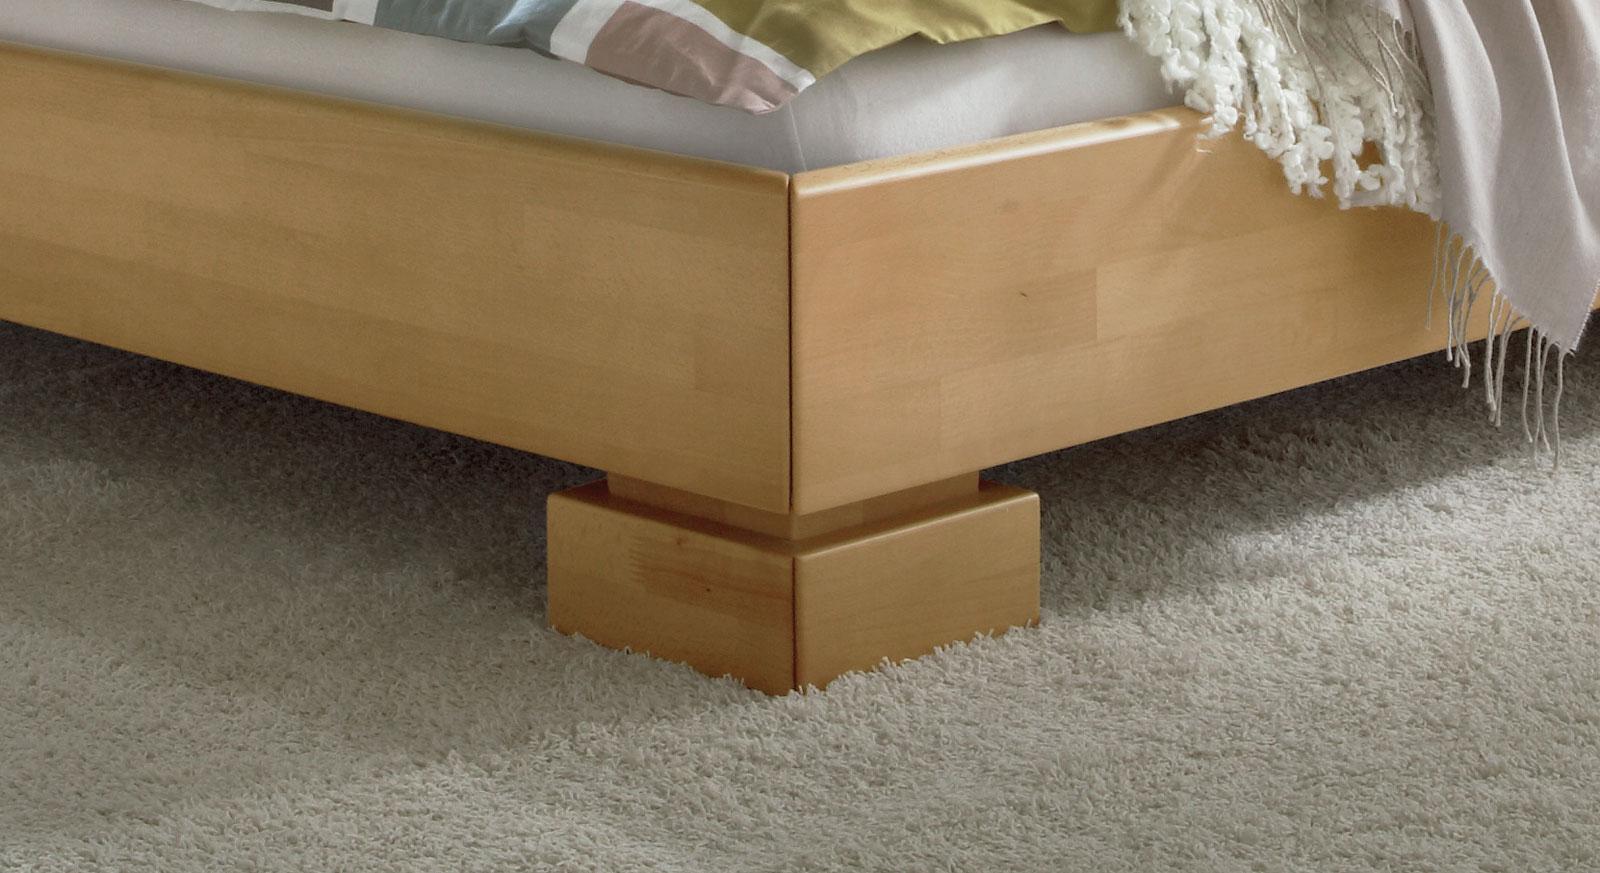 Bett Lima mit robustem Blockfüßen